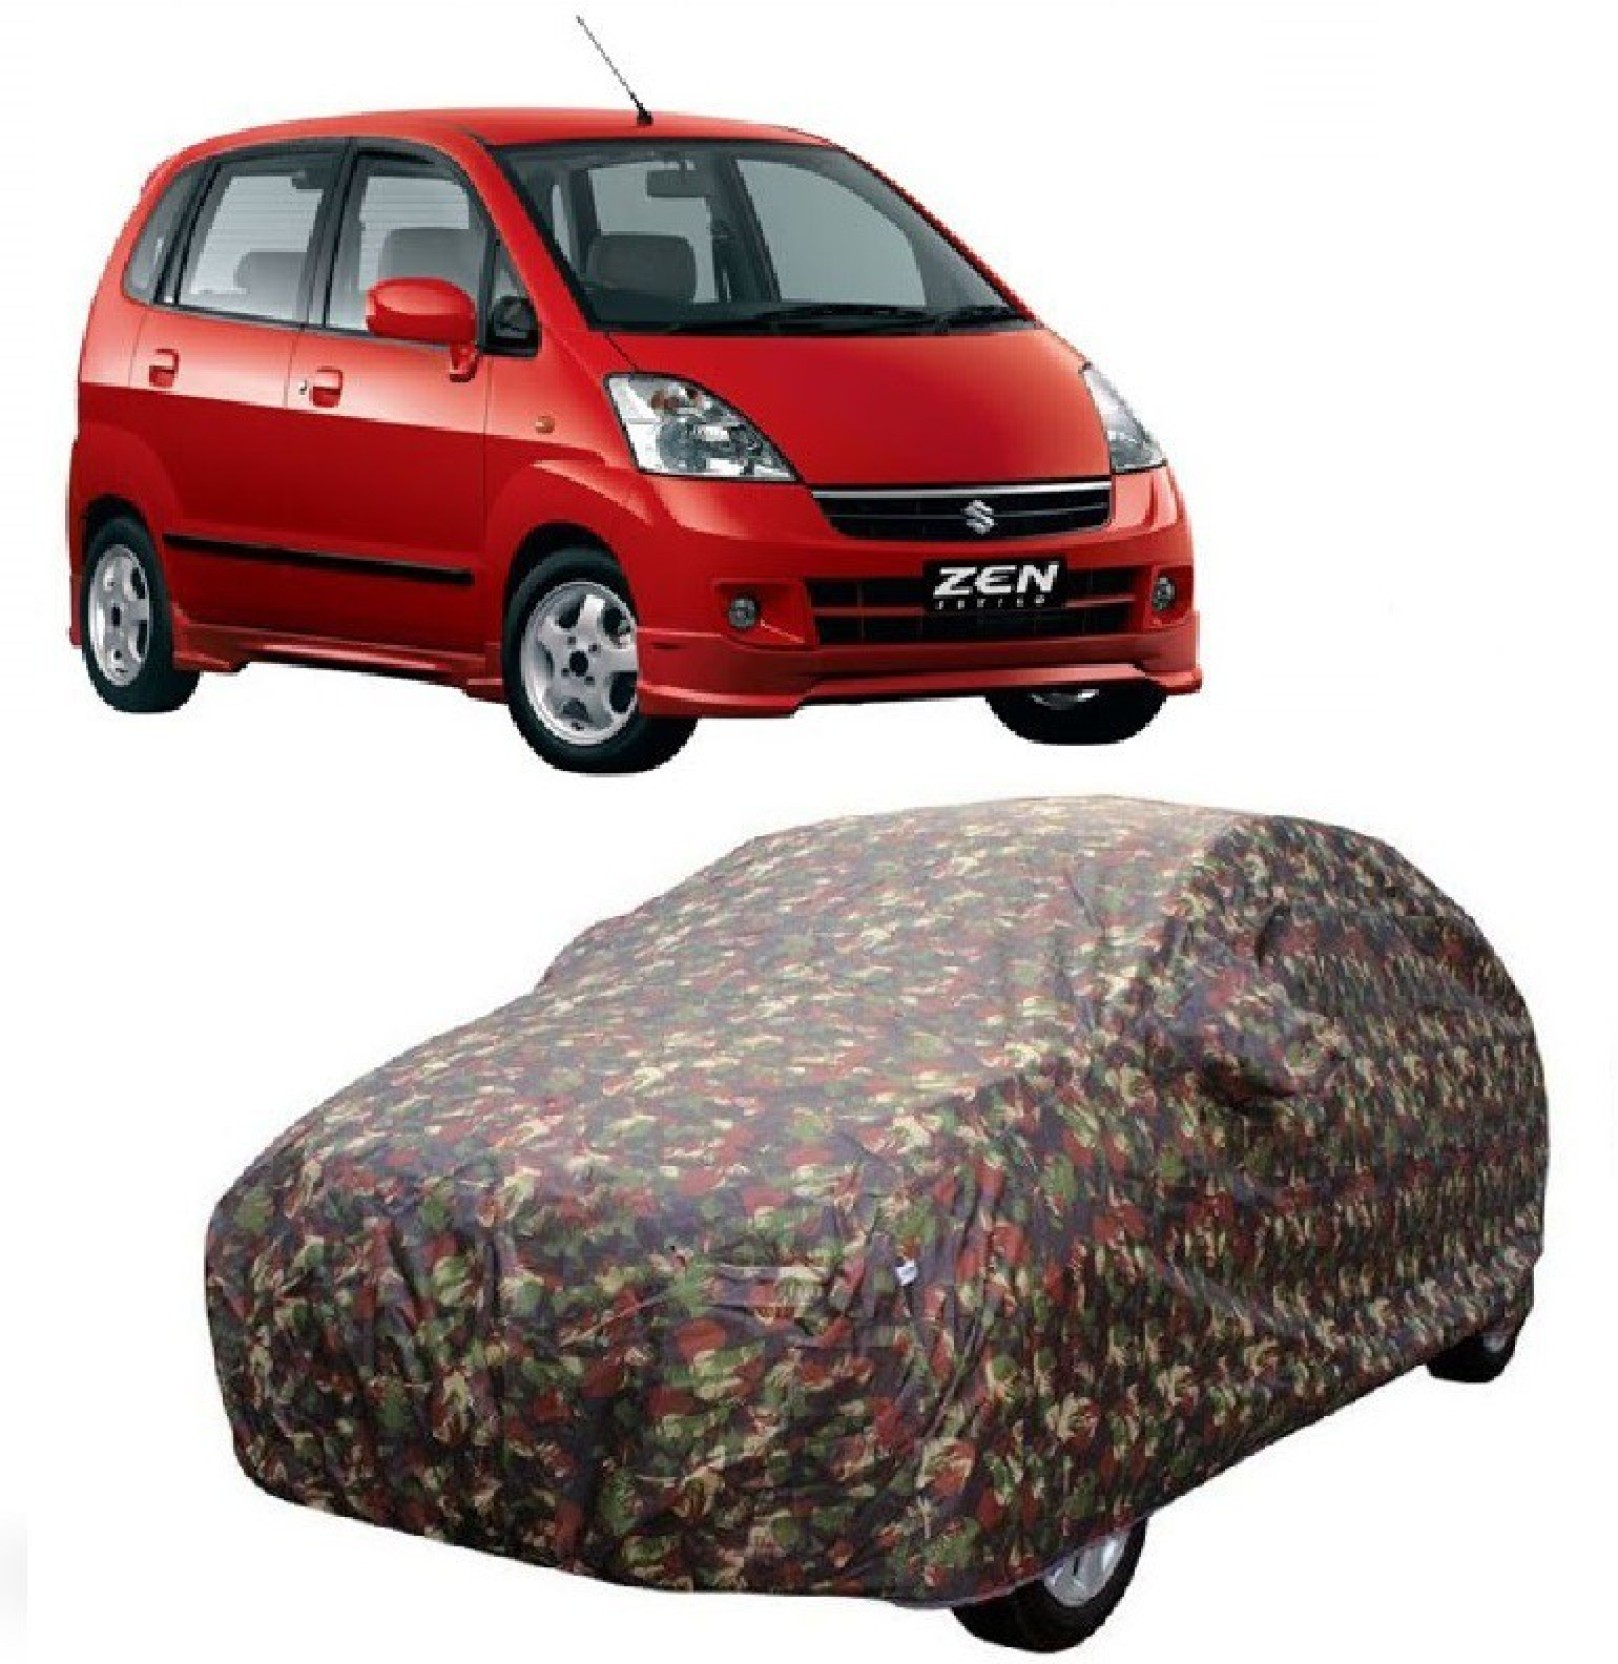 Motrox car cover for maruti suzuki zen estilo with mirror pockets multicolor